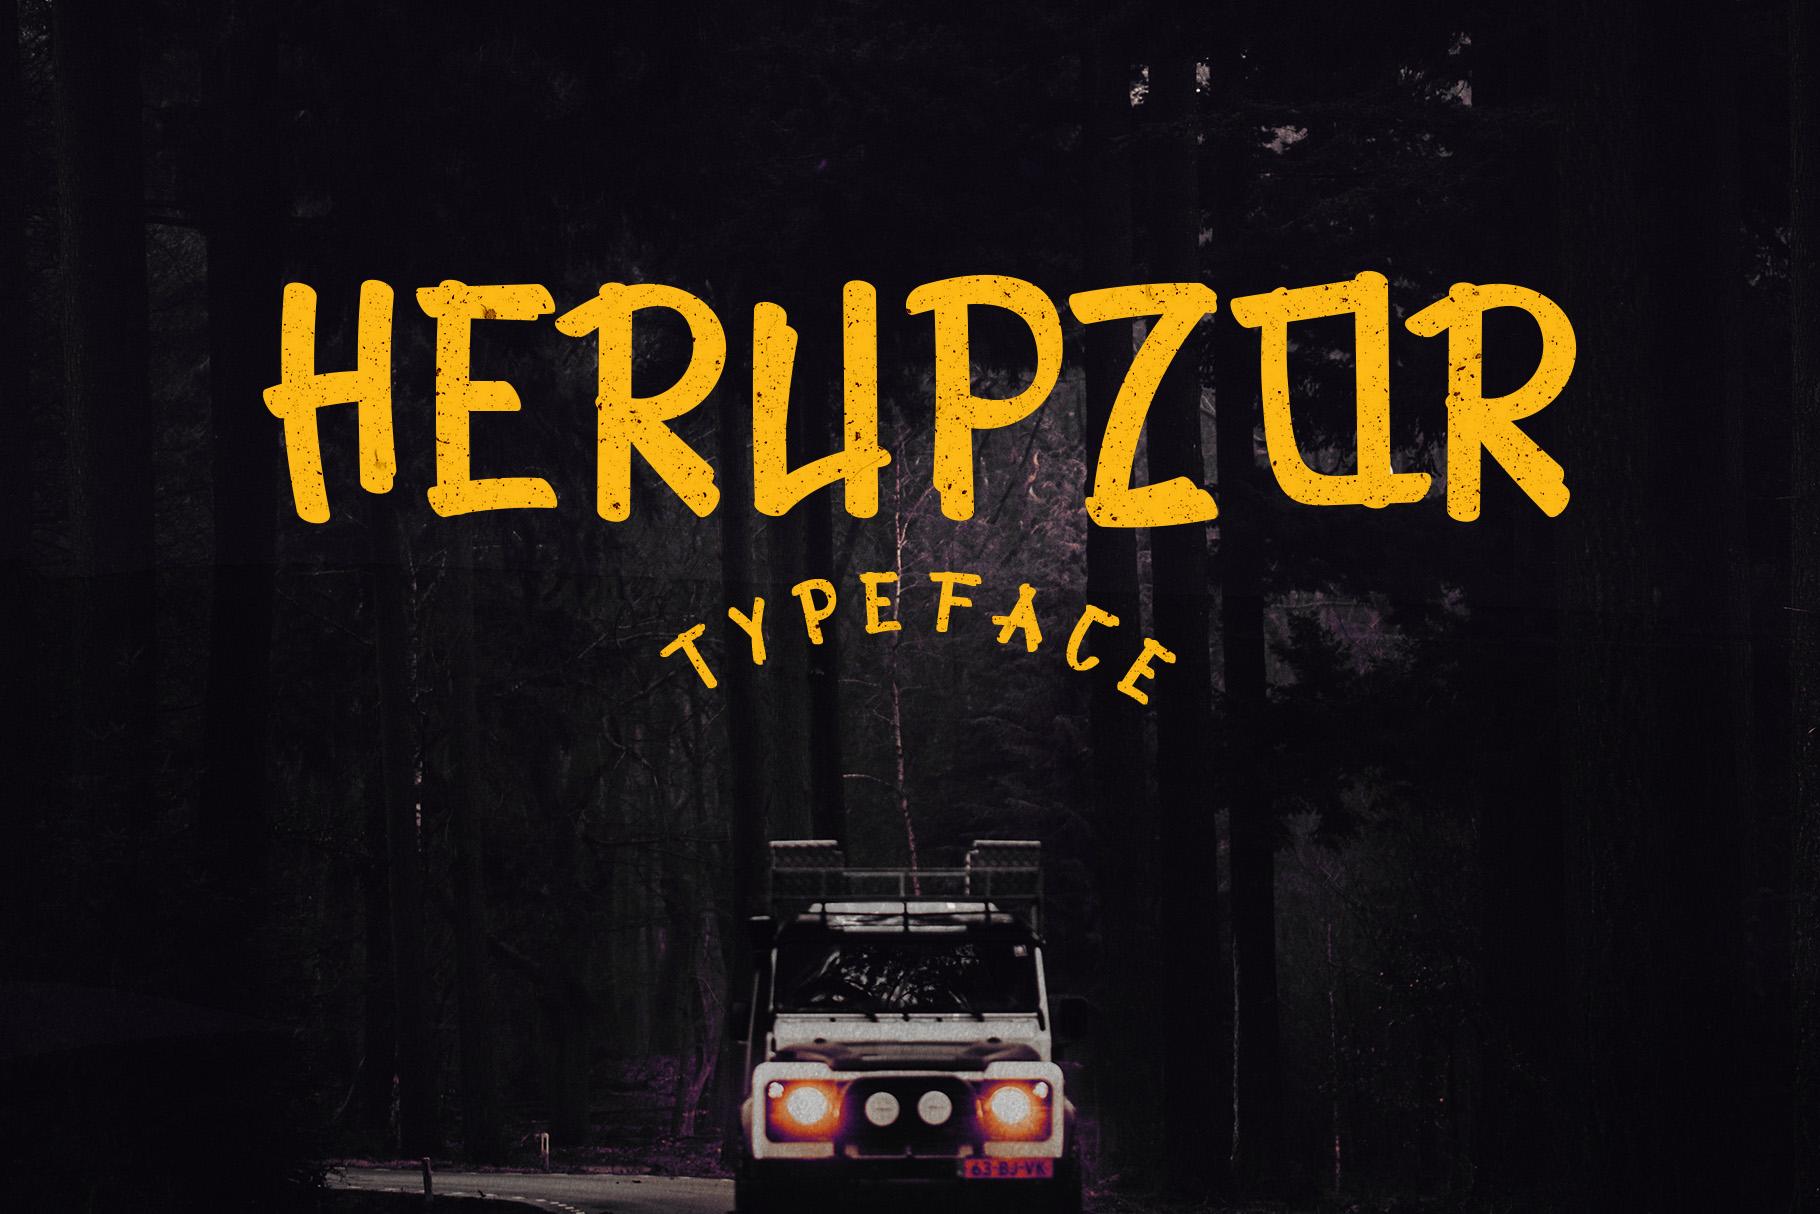 Herupzor Typeface example image 1